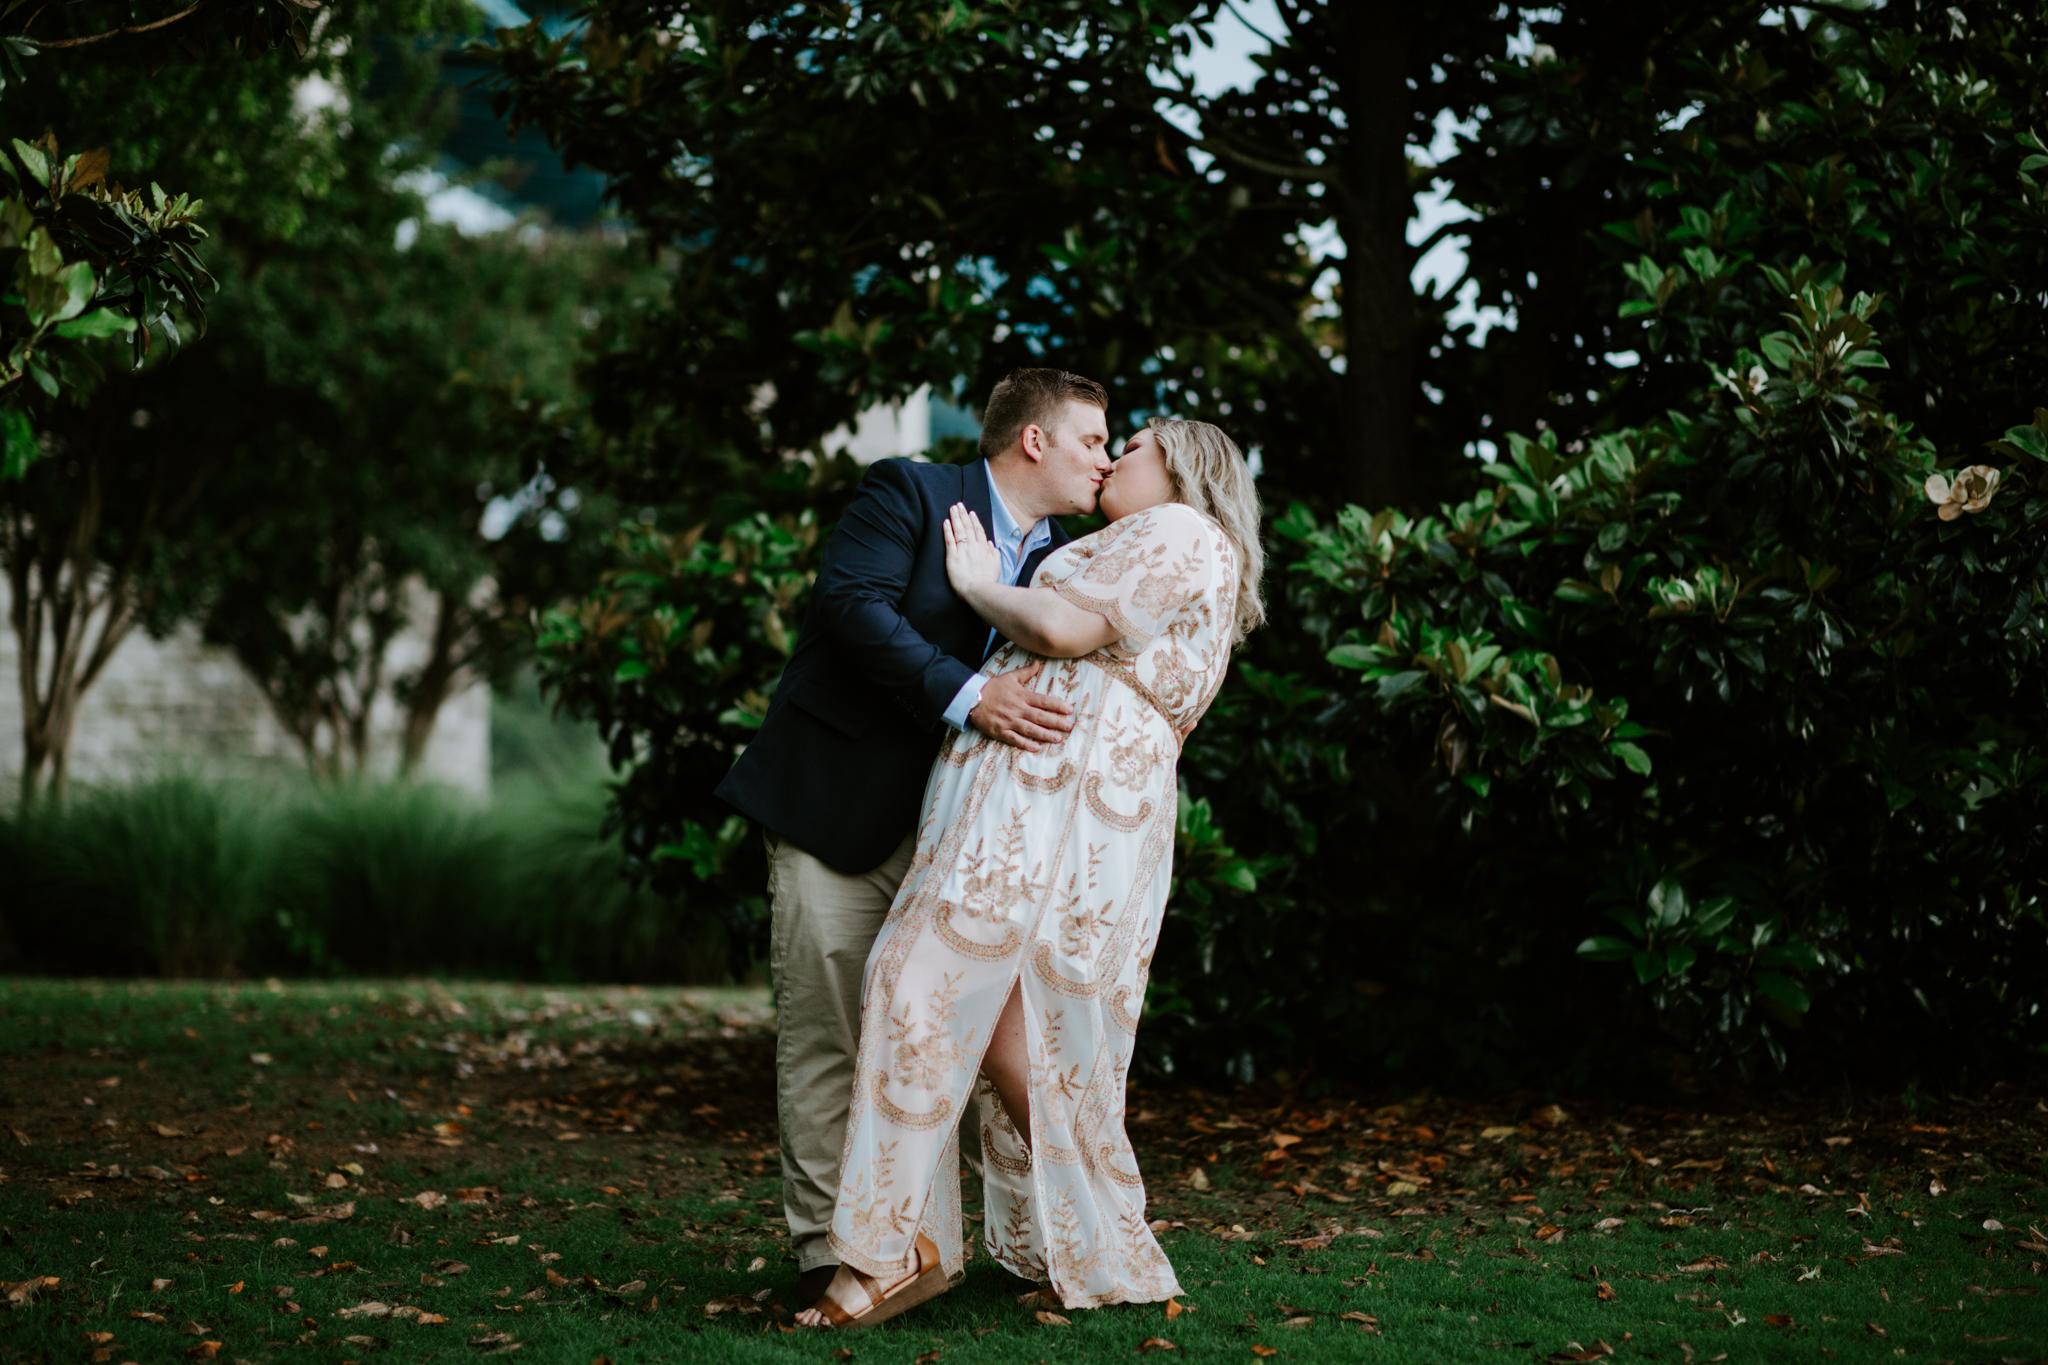 Ryley + Dalton + Chattanooga + Nashville + Knoxville+ Wedding + Engagement + Photographer-49.jpg